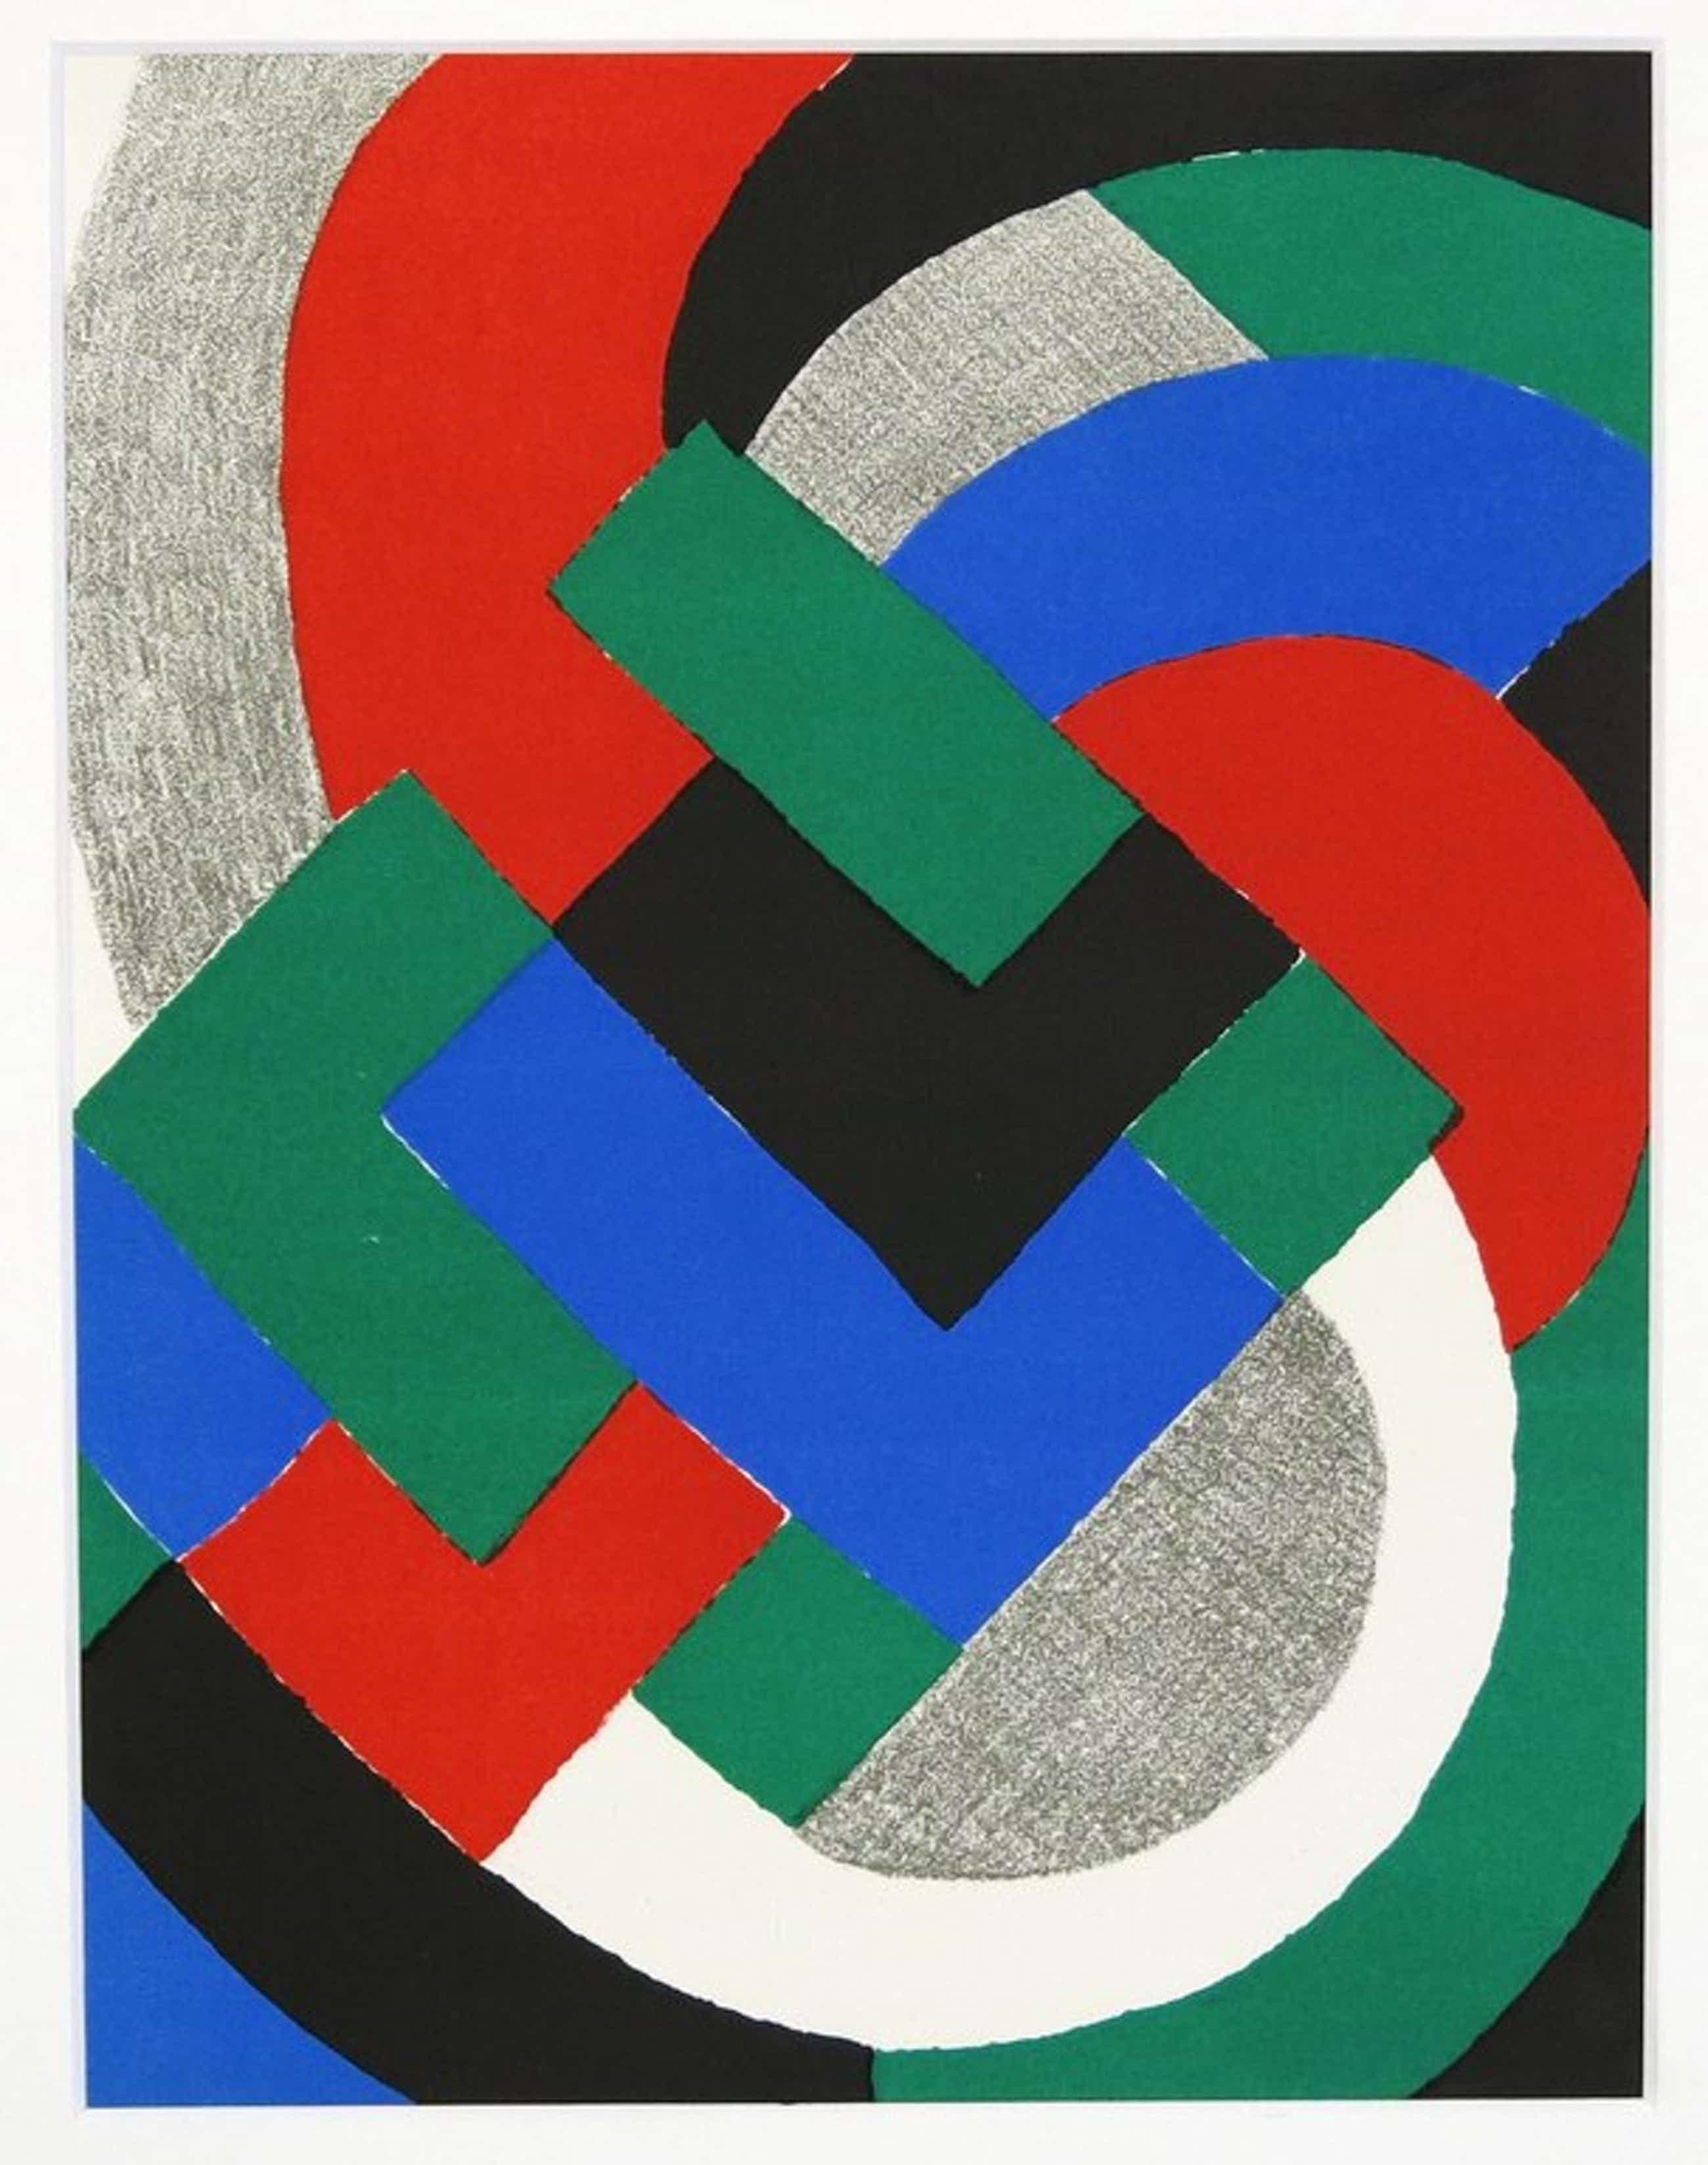 Sonia Delaunay: Litho in passe-partout, Simultanisme kopen? Bied vanaf 35!